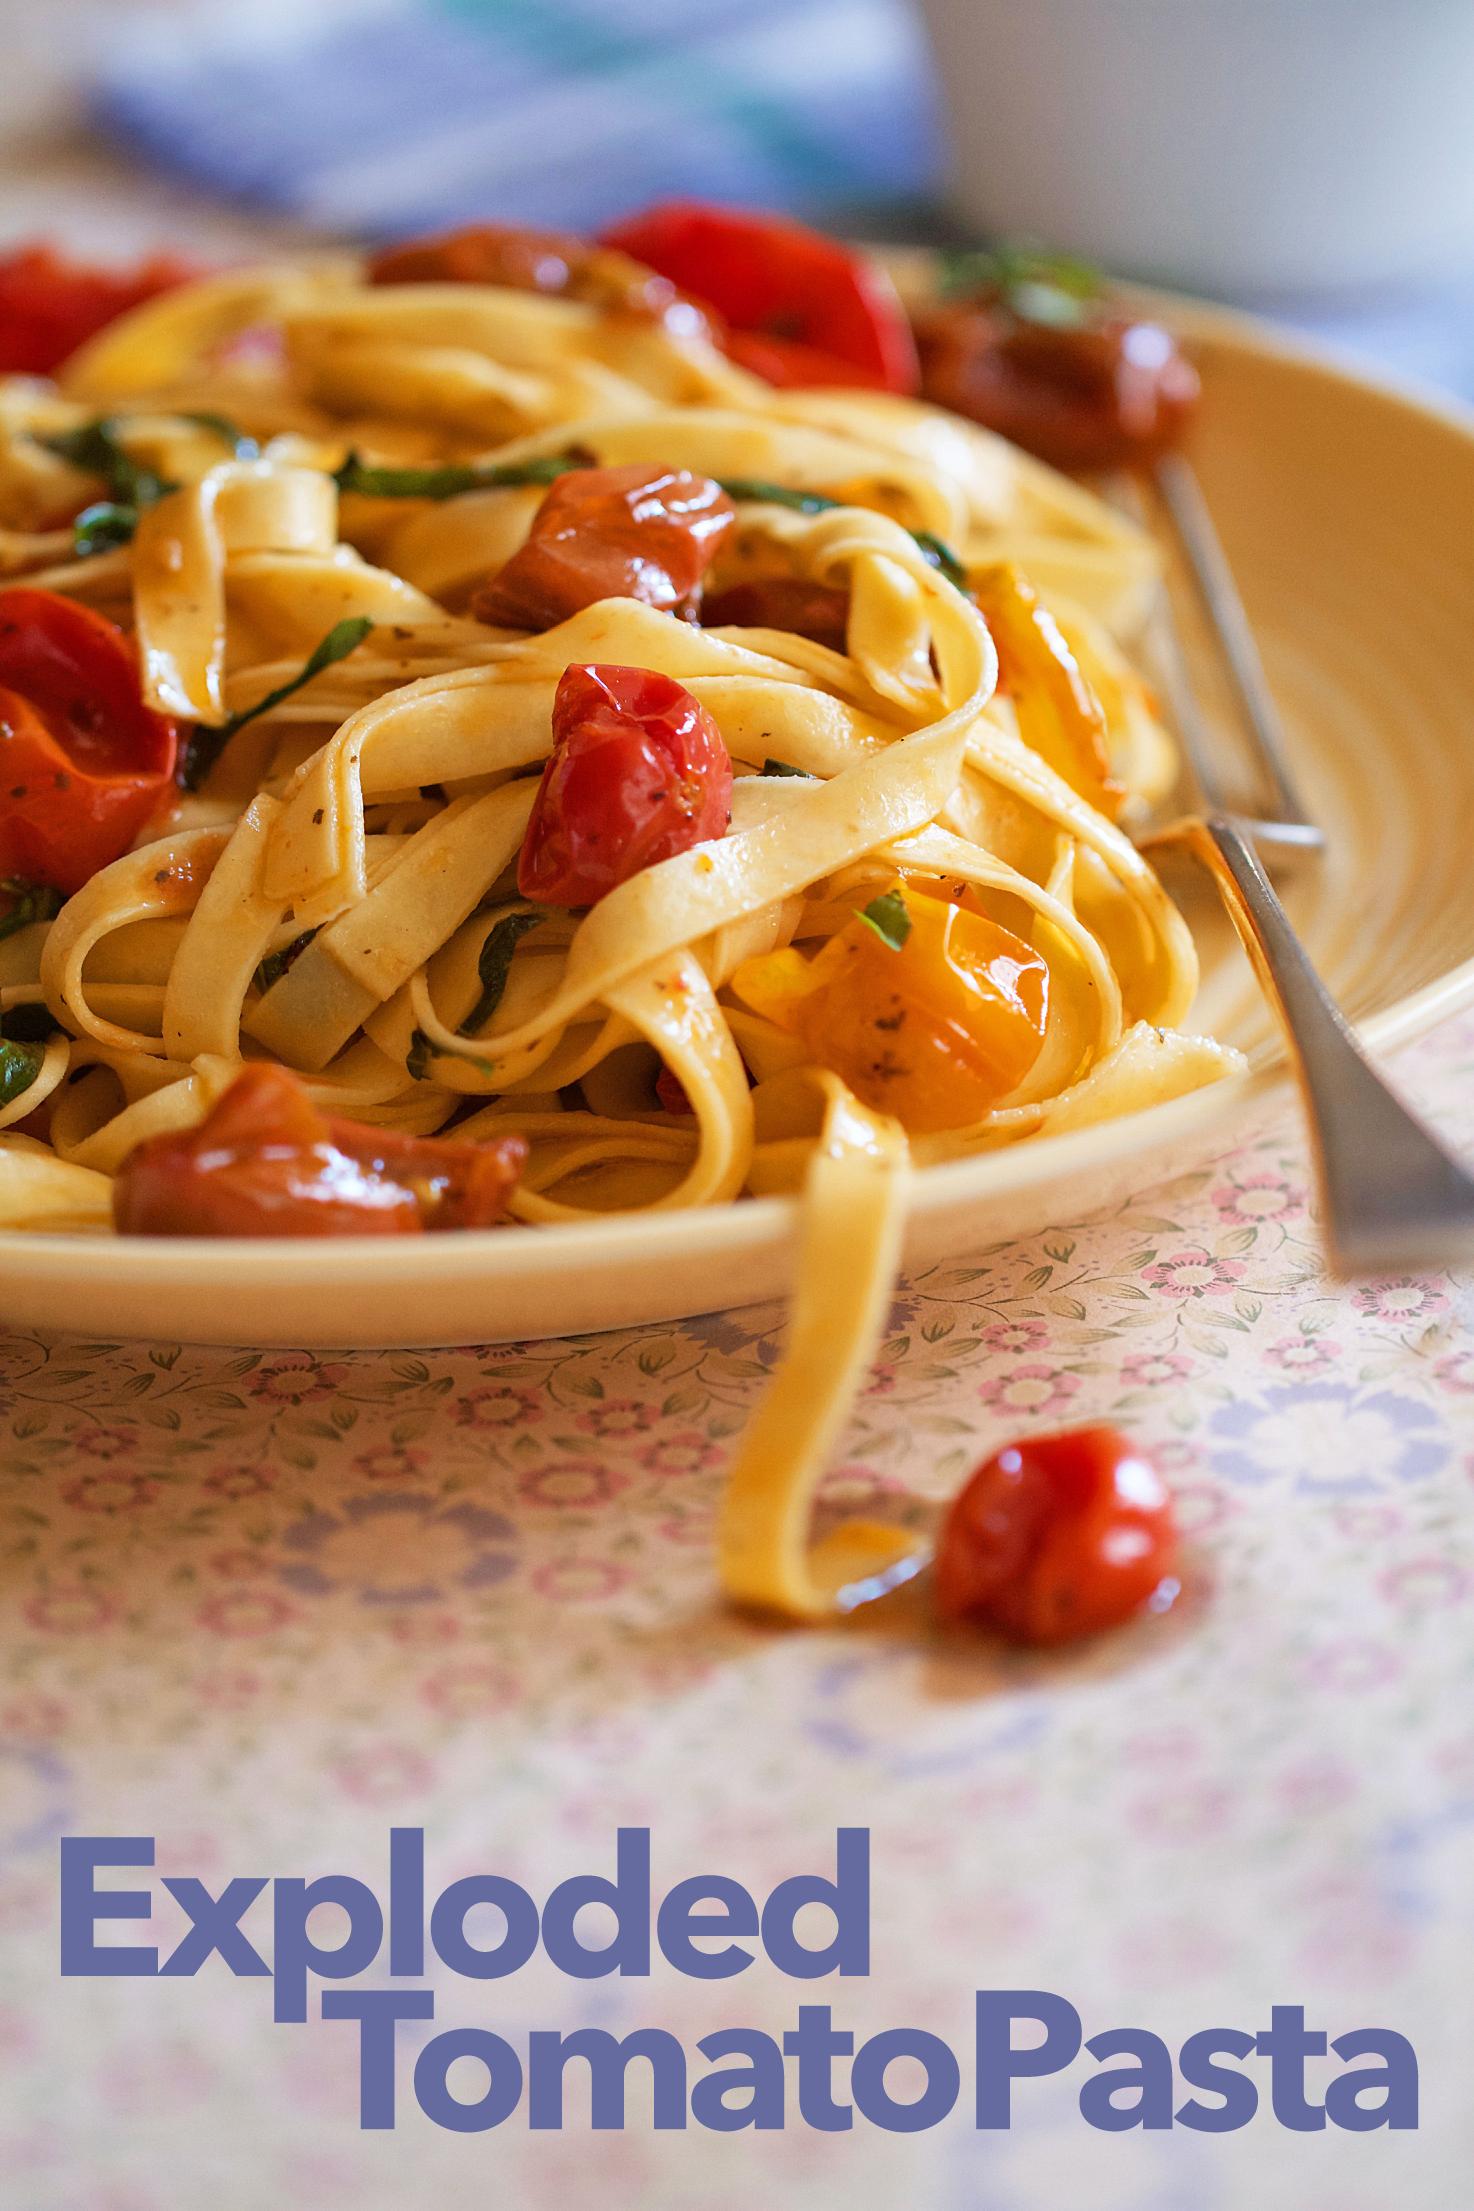 Pomodori Scoppiati (Exploded Cherry Tomato Sauce)